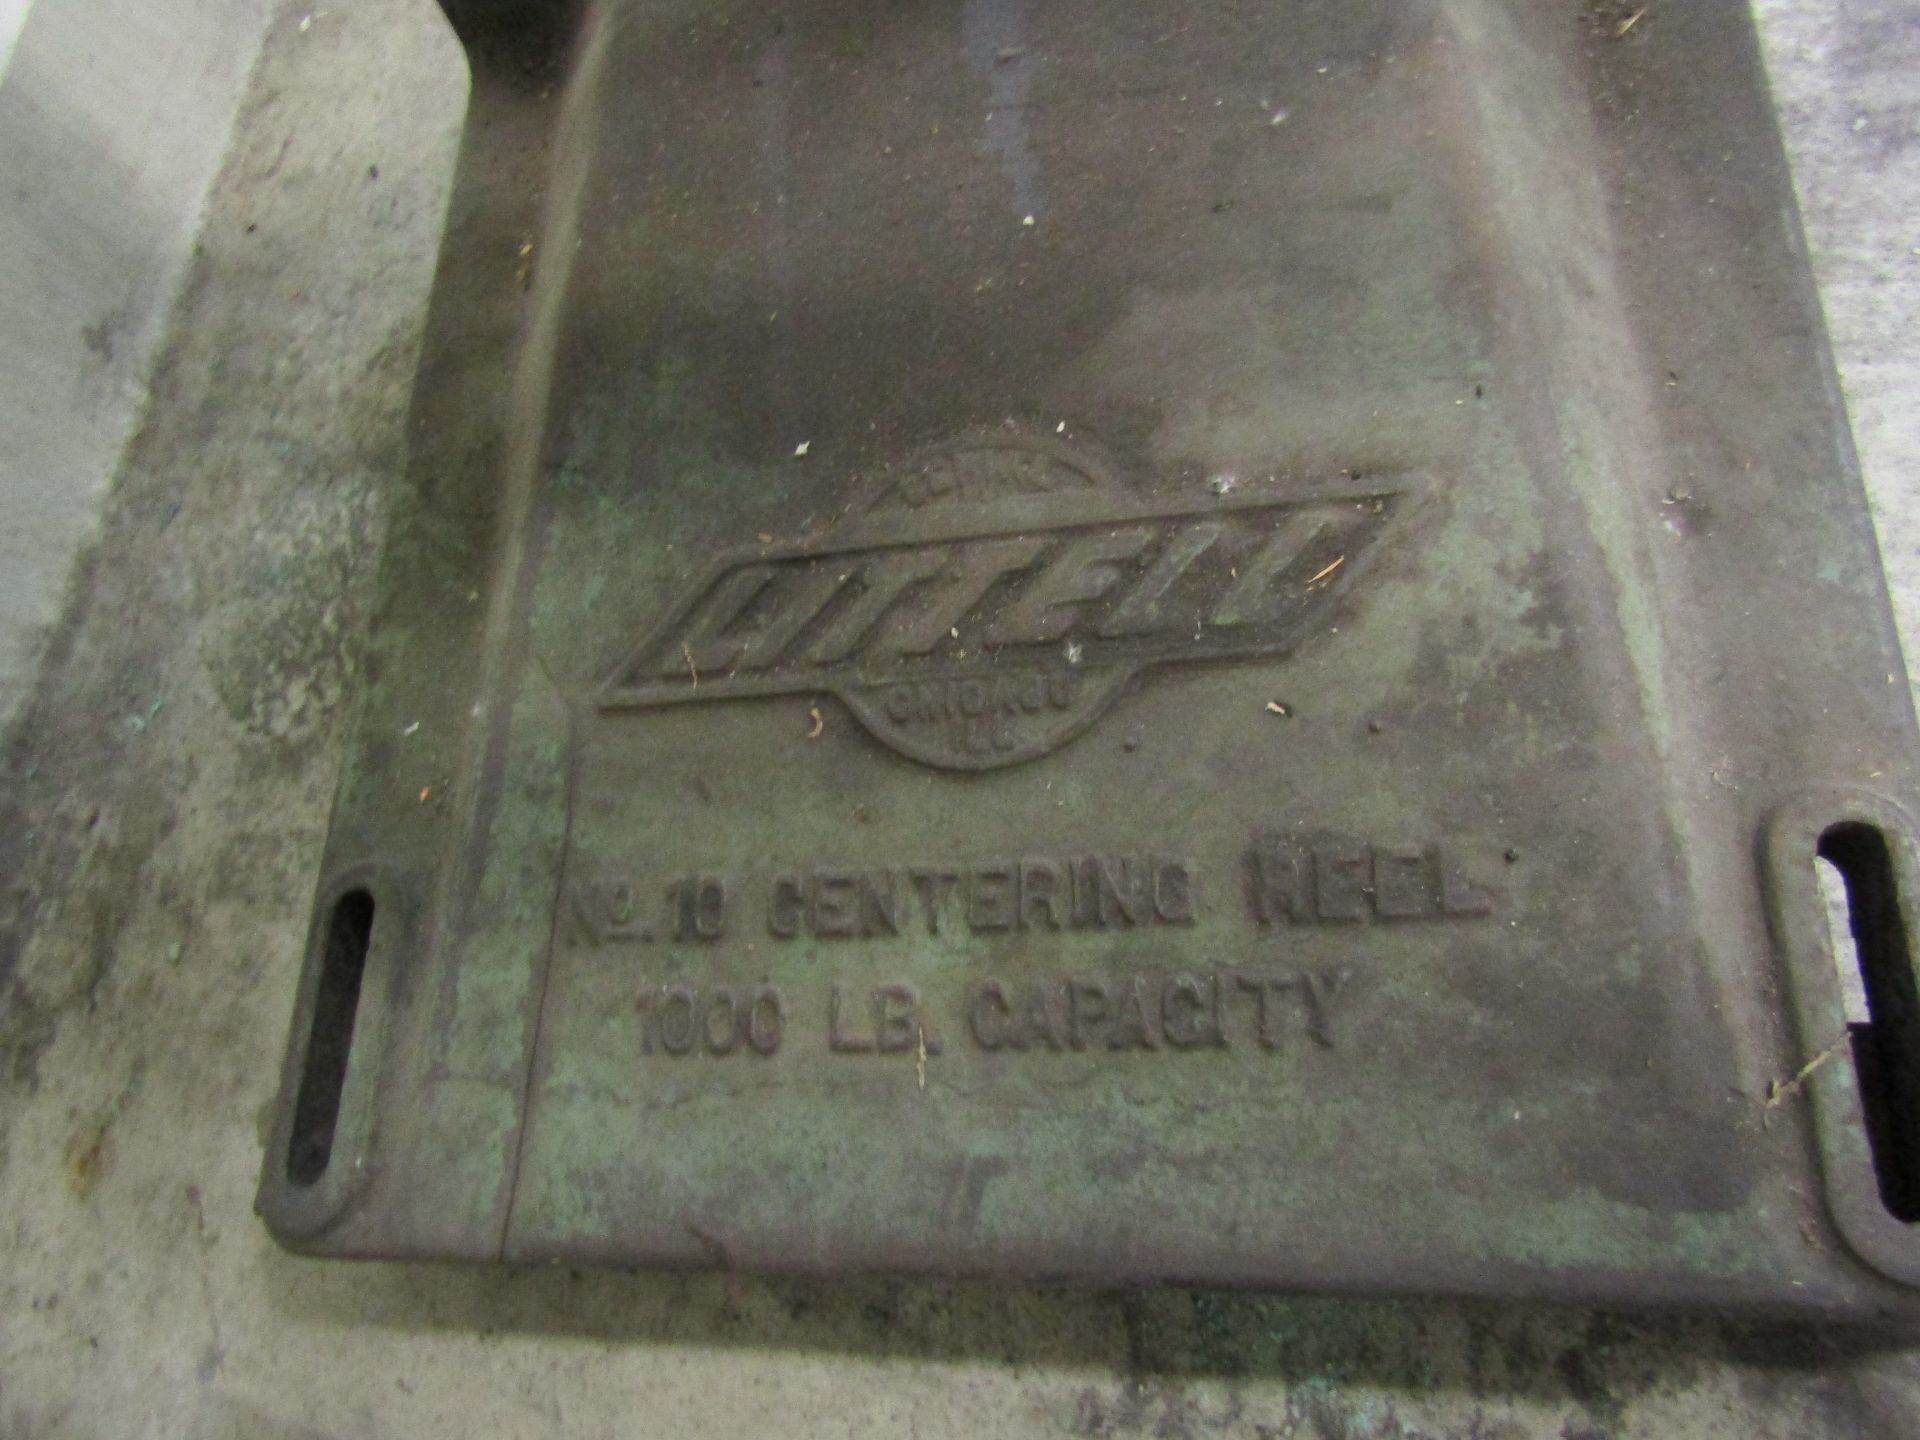 Lot 24 - LITTEL NO.10 Decoiler Reel, 1,000 LB Cap (For Blanking Press Strip Feed Line)